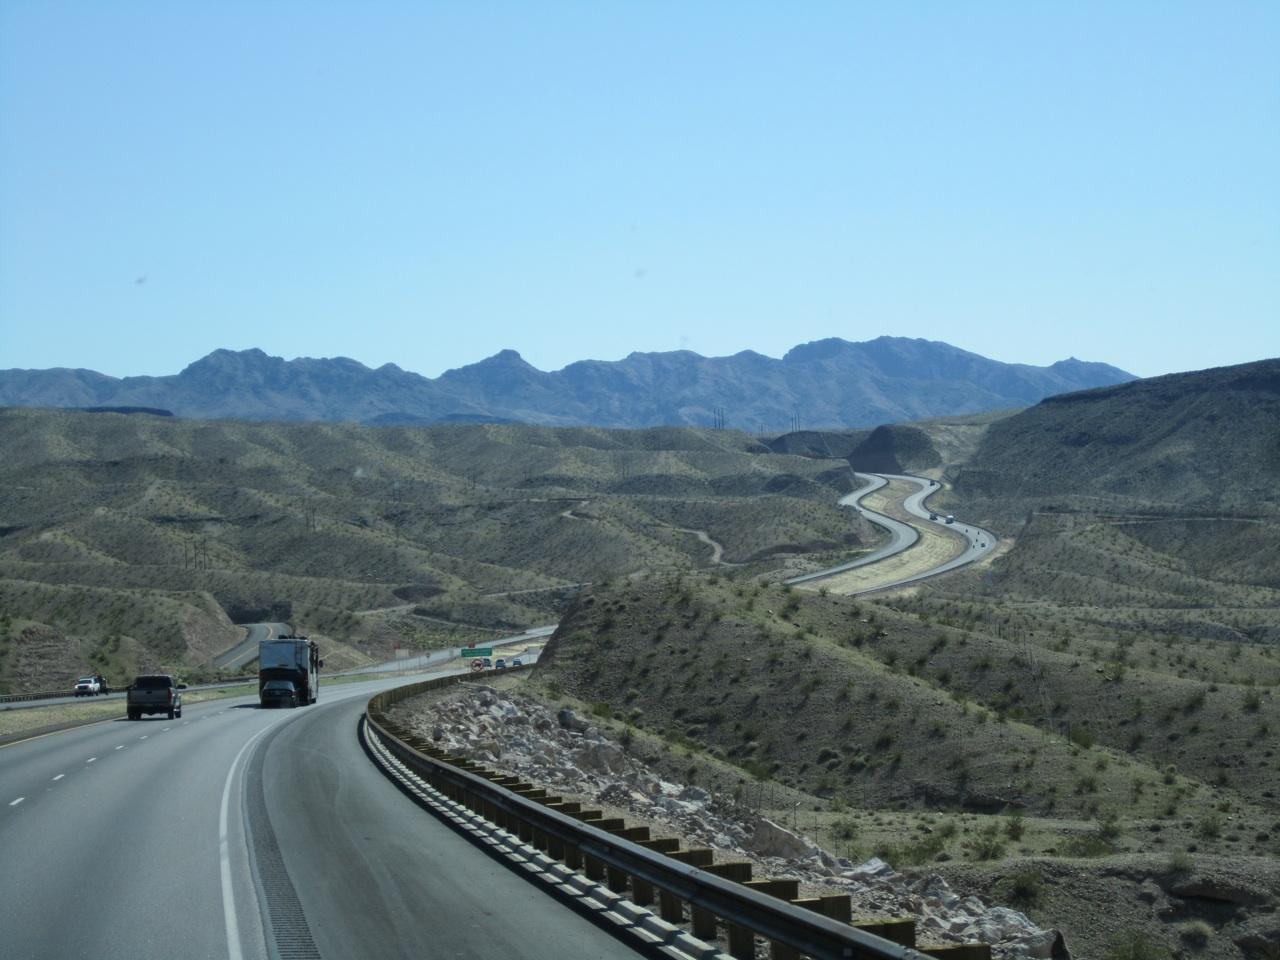 The Road Leaving The Lake Mead Area, Heading To Kingman, AZ